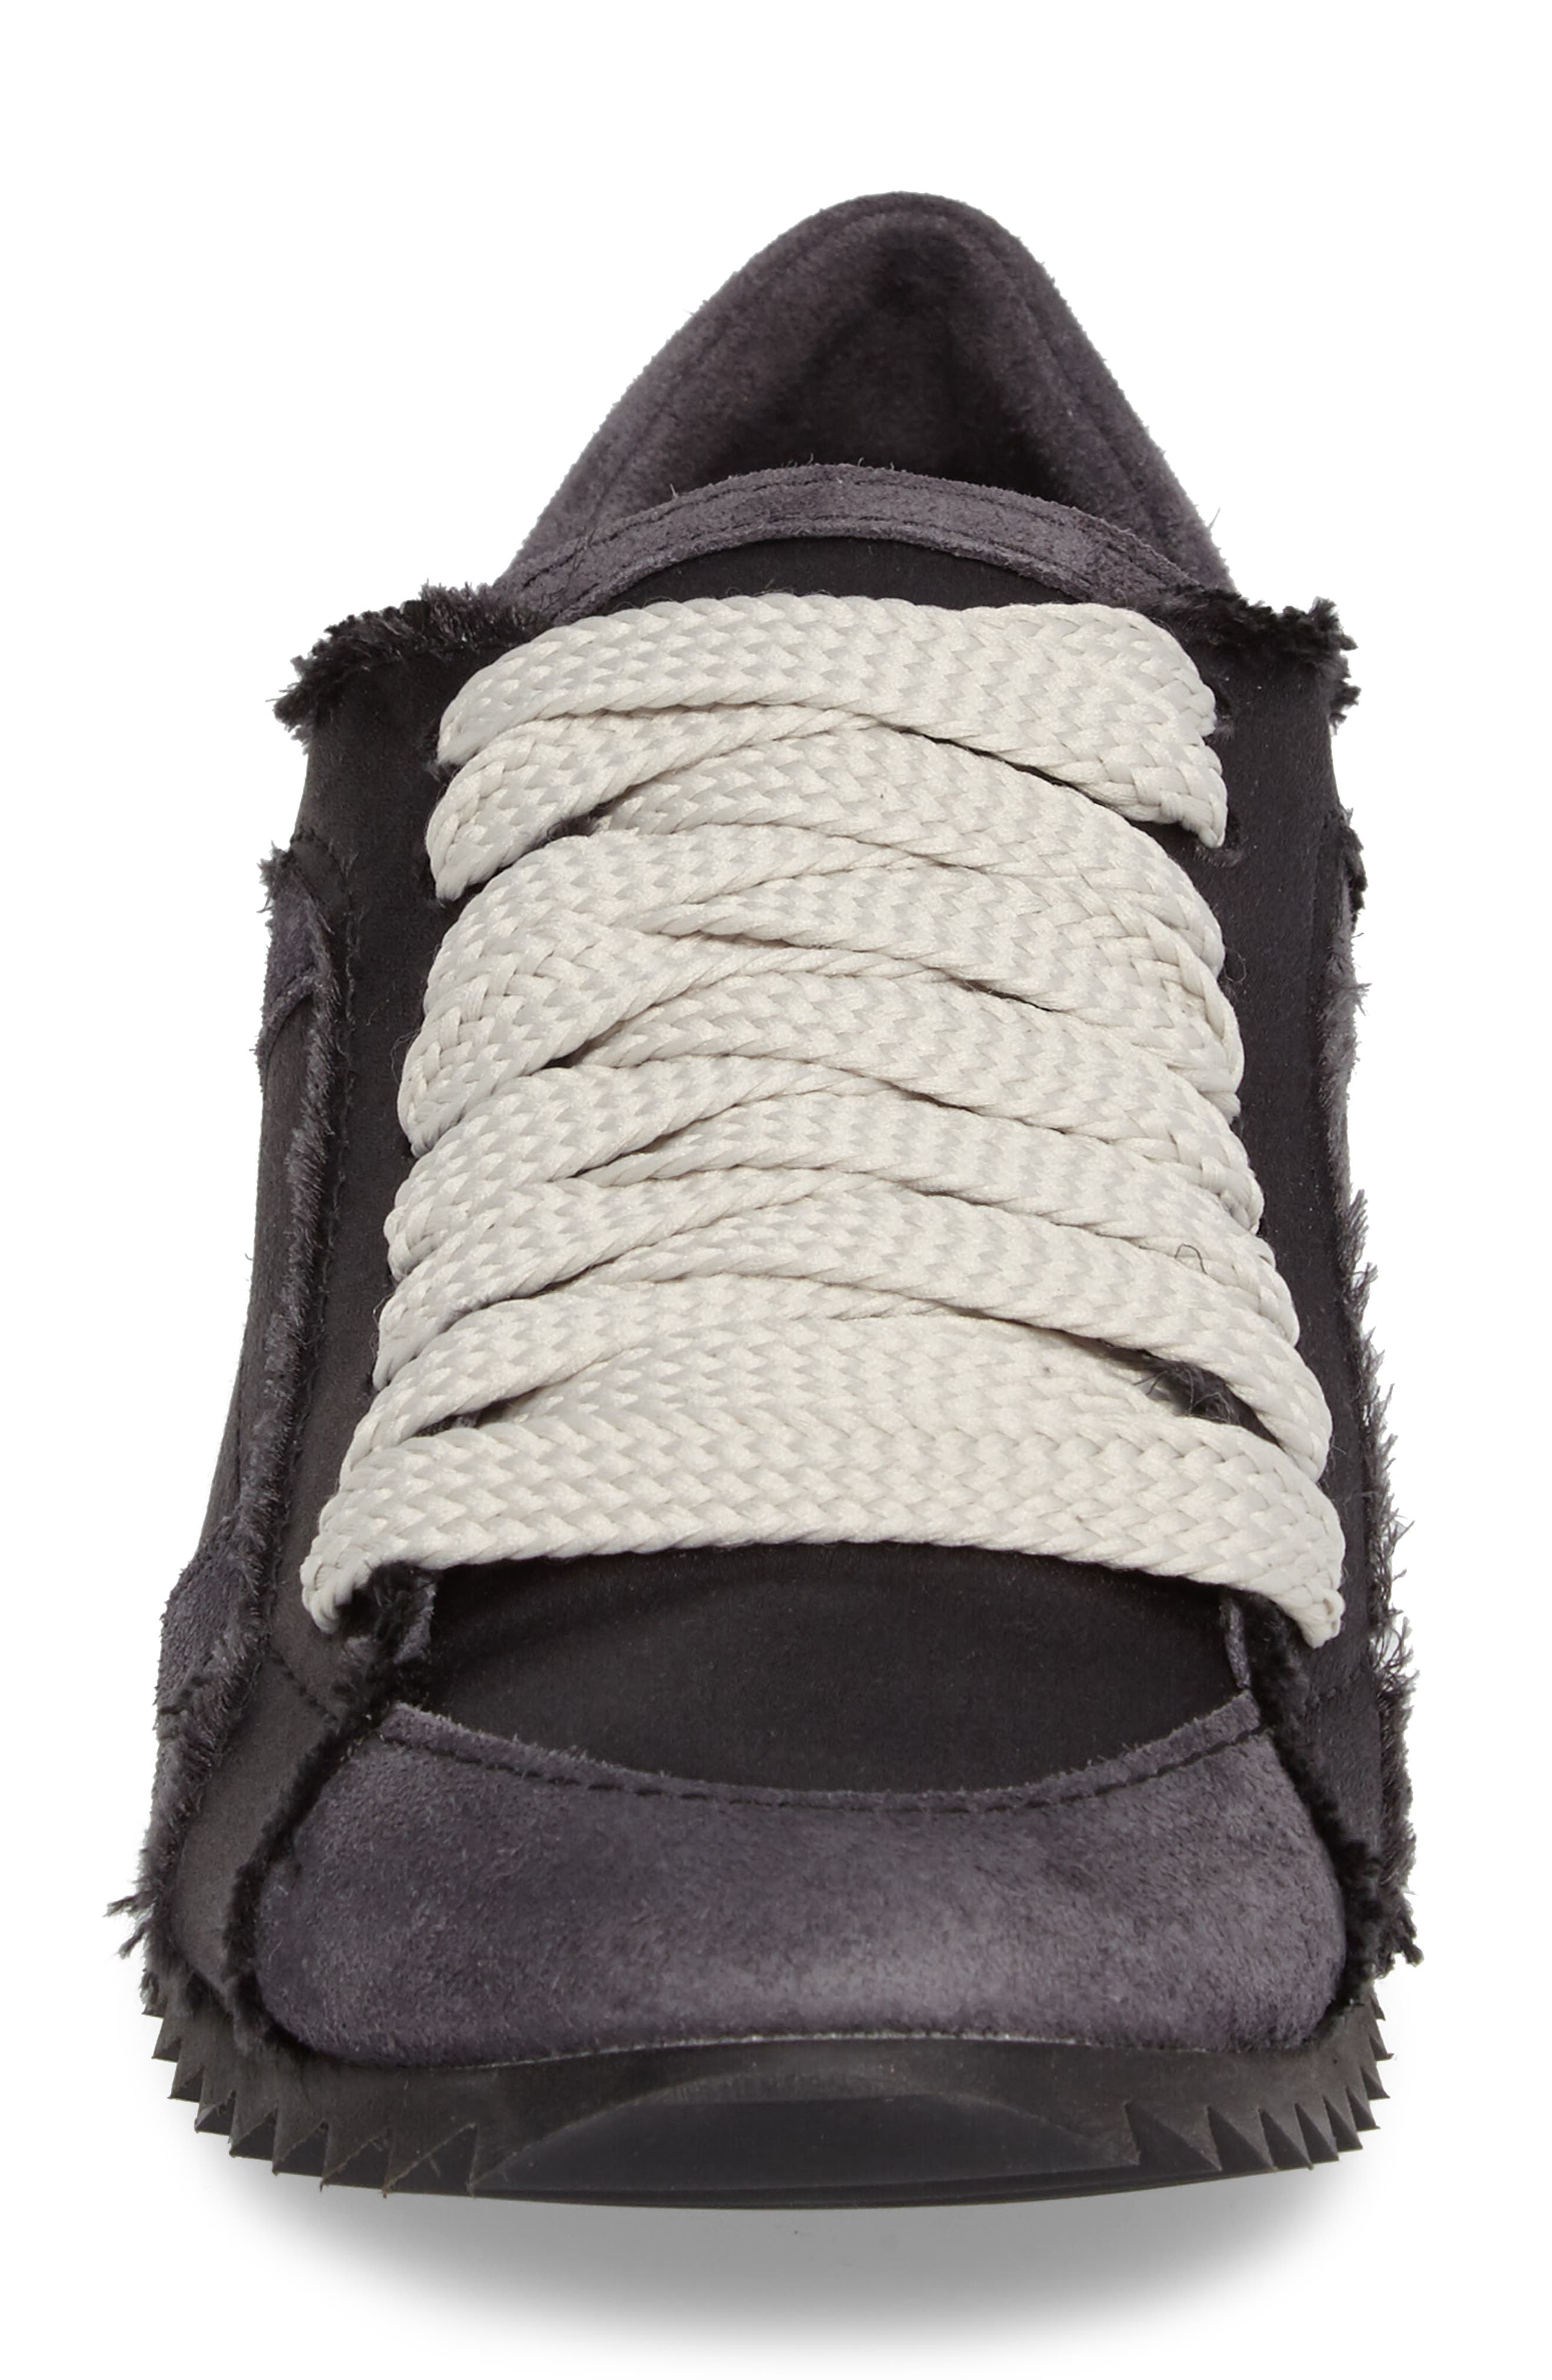 Cristina Trainer Sneaker,                             Alternate thumbnail 4, color,                             001